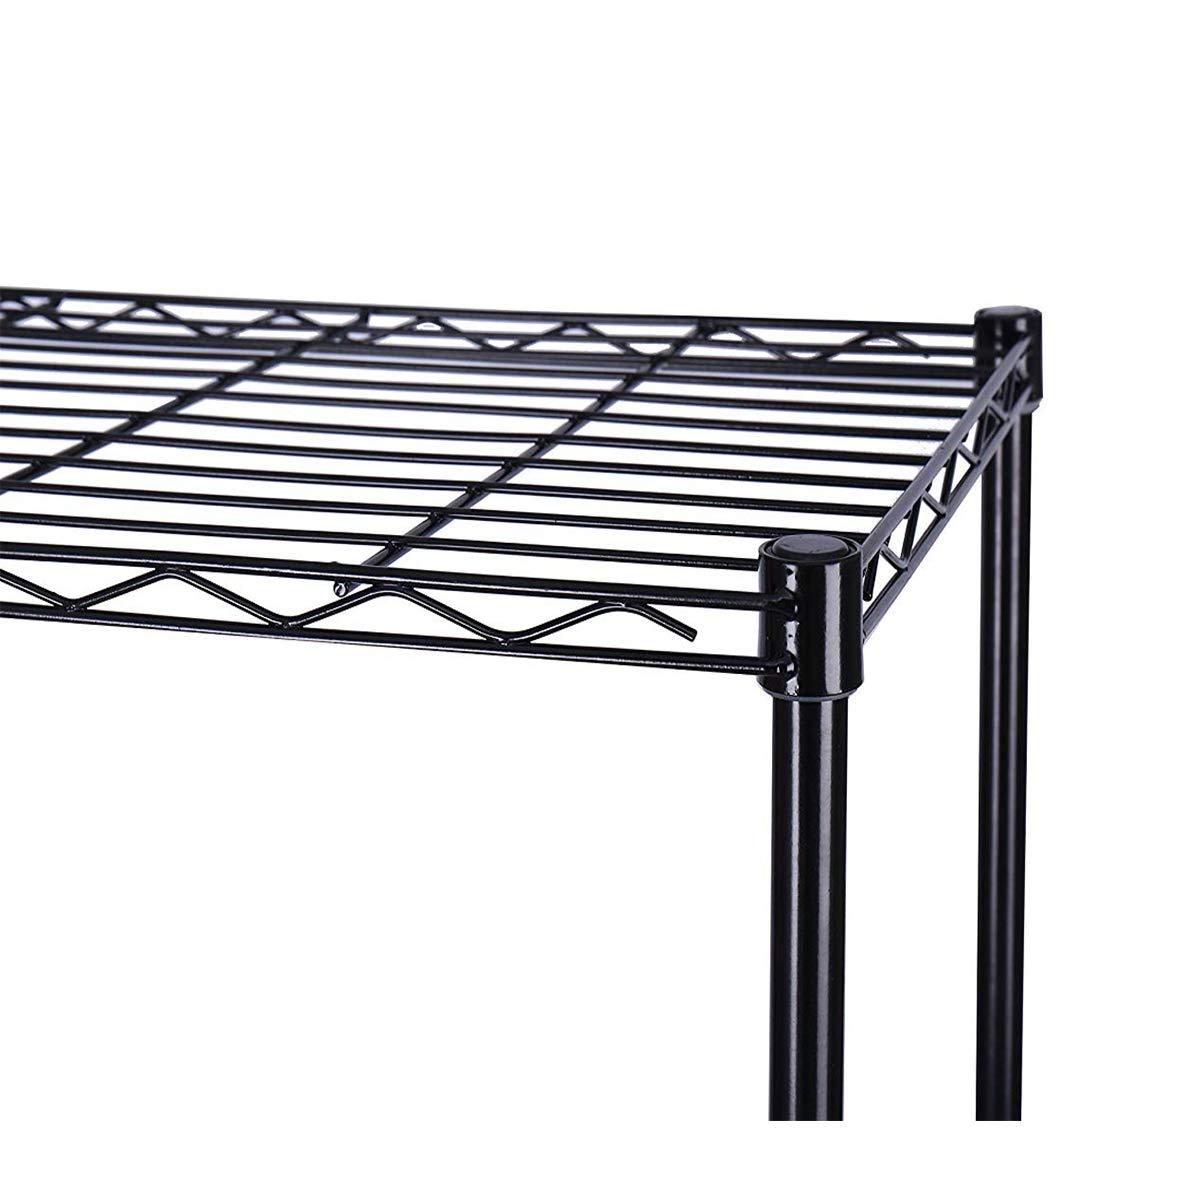 GSYX 4-Shelf Shelving Unit, Industrial Storage Bookshelf Rack, Metal 4-Tiers Bookcase Home Office Shelf Storage Rack -Small Space Solution (Black, 4-Shelf-Big)